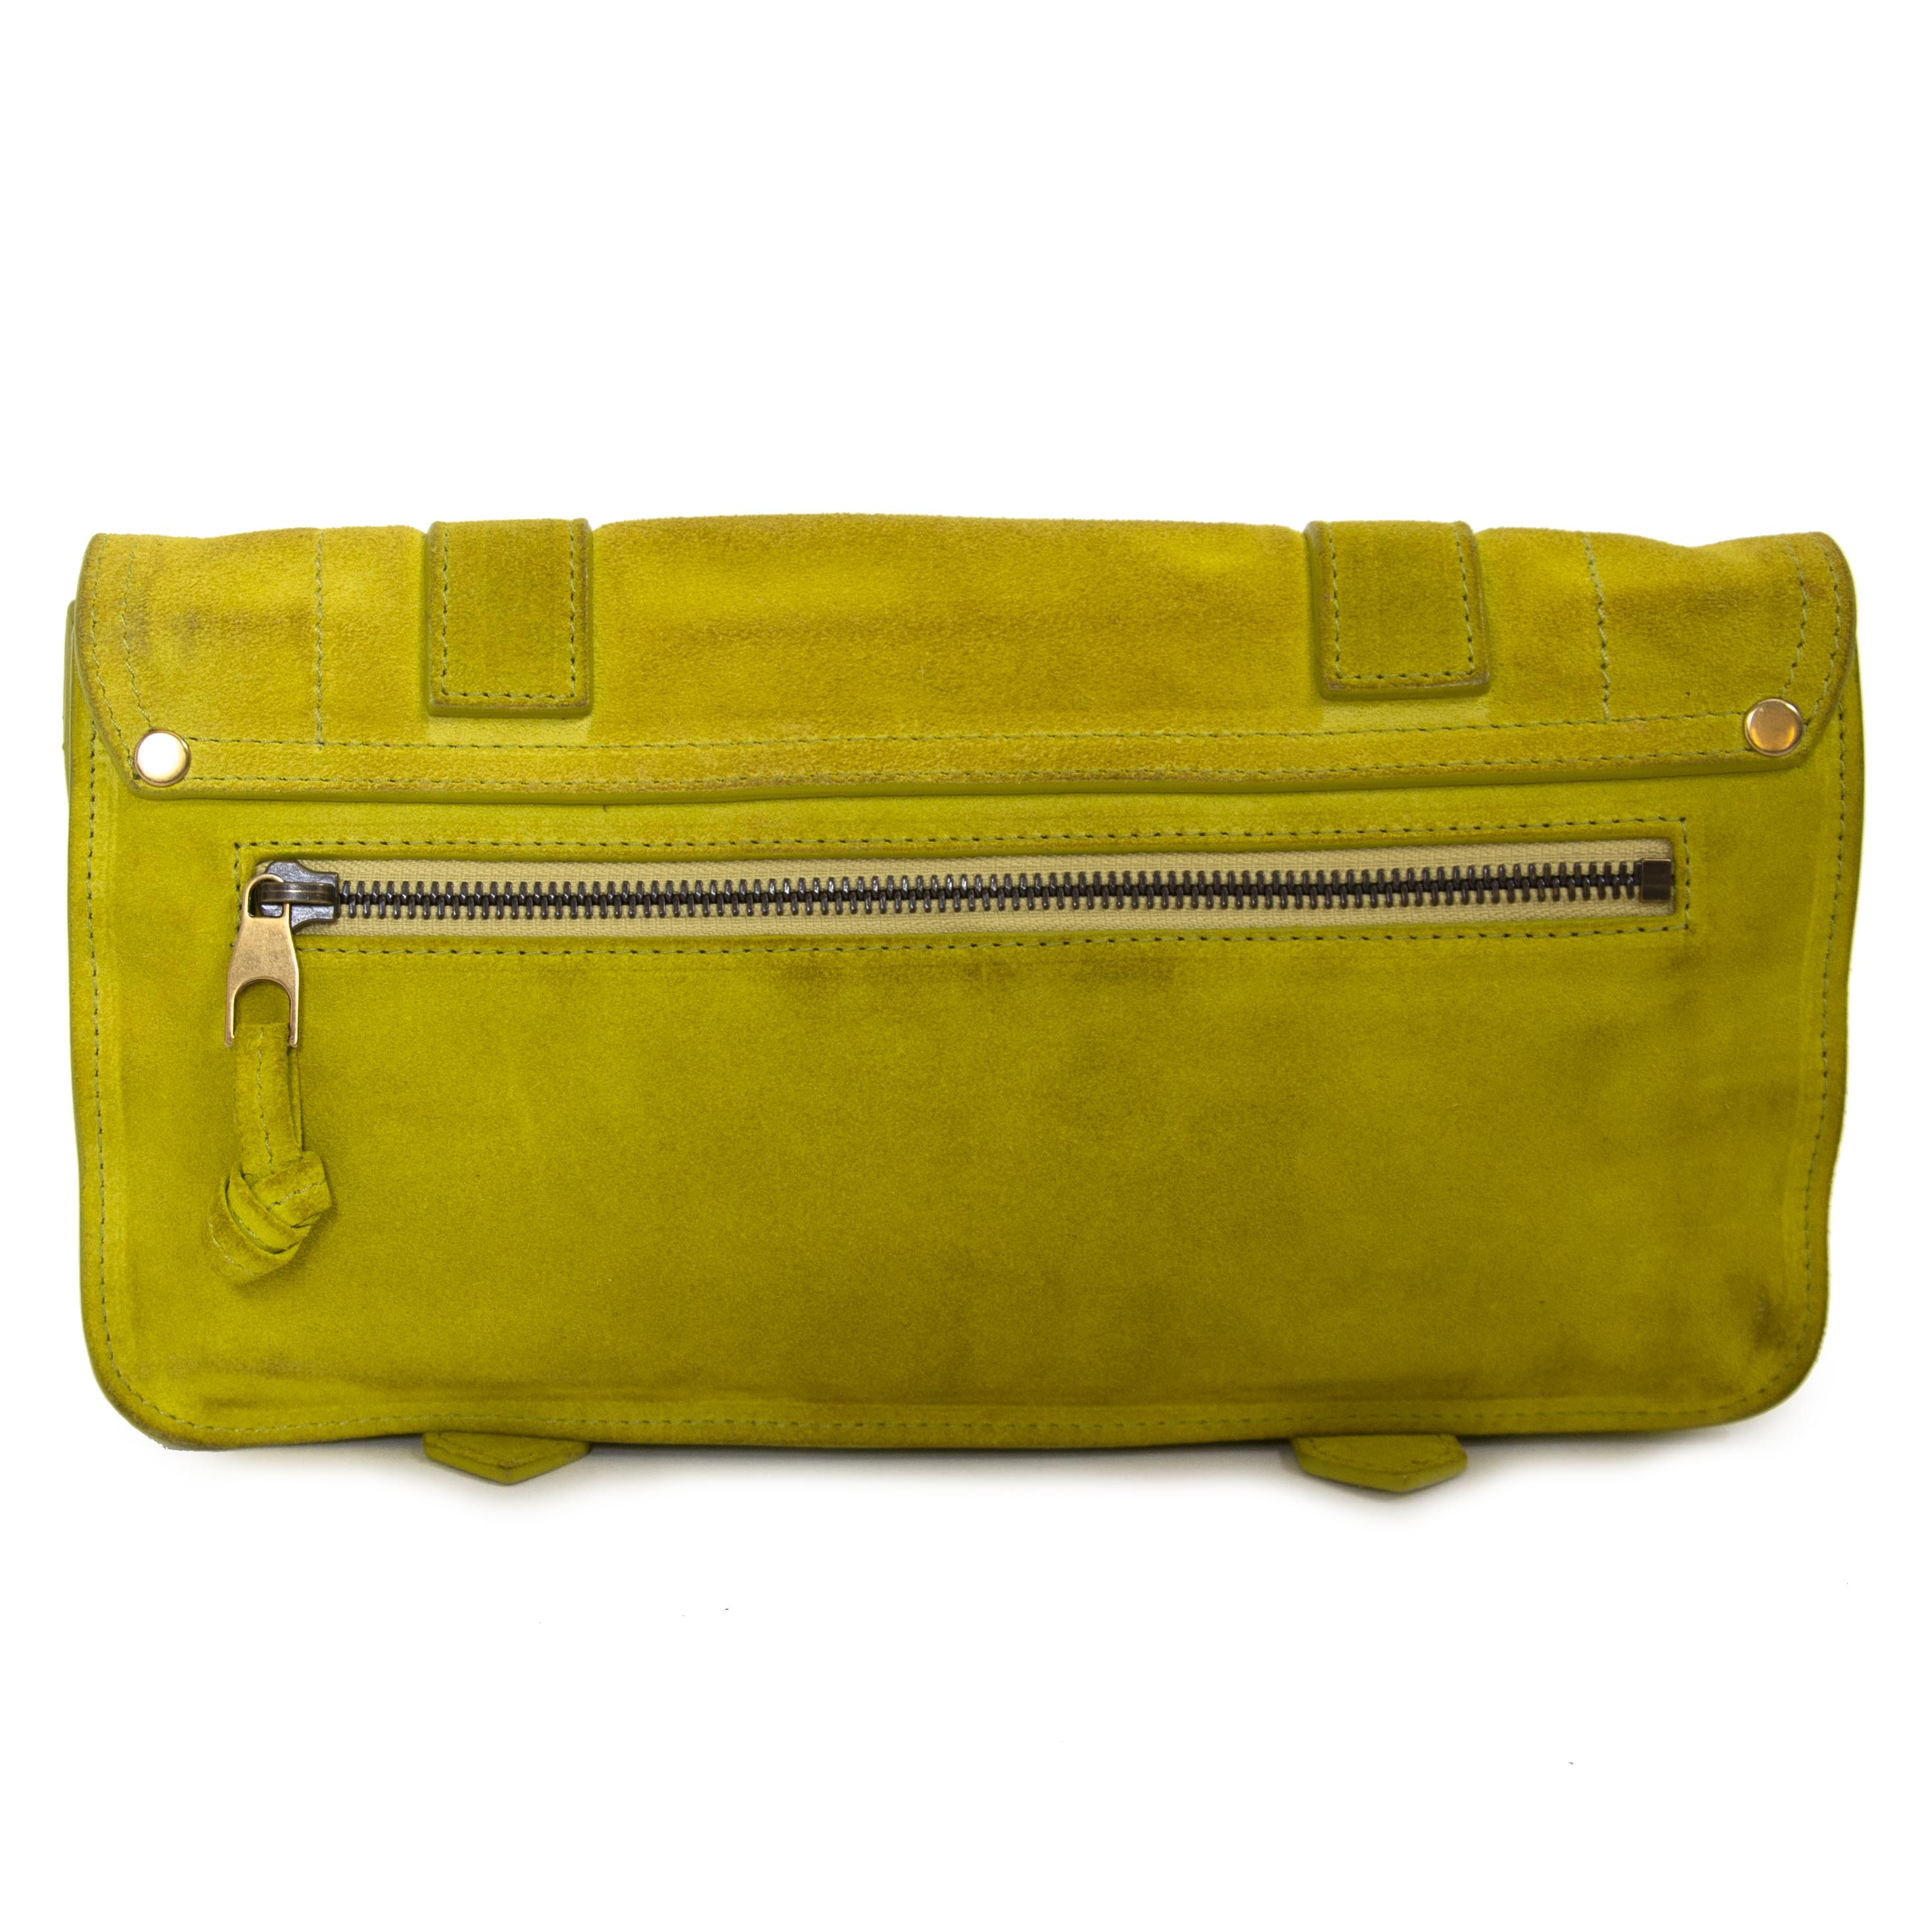 Labellov Shop Authentic Vintage Luxury Designer Handbags Online ... 584562560c5d4